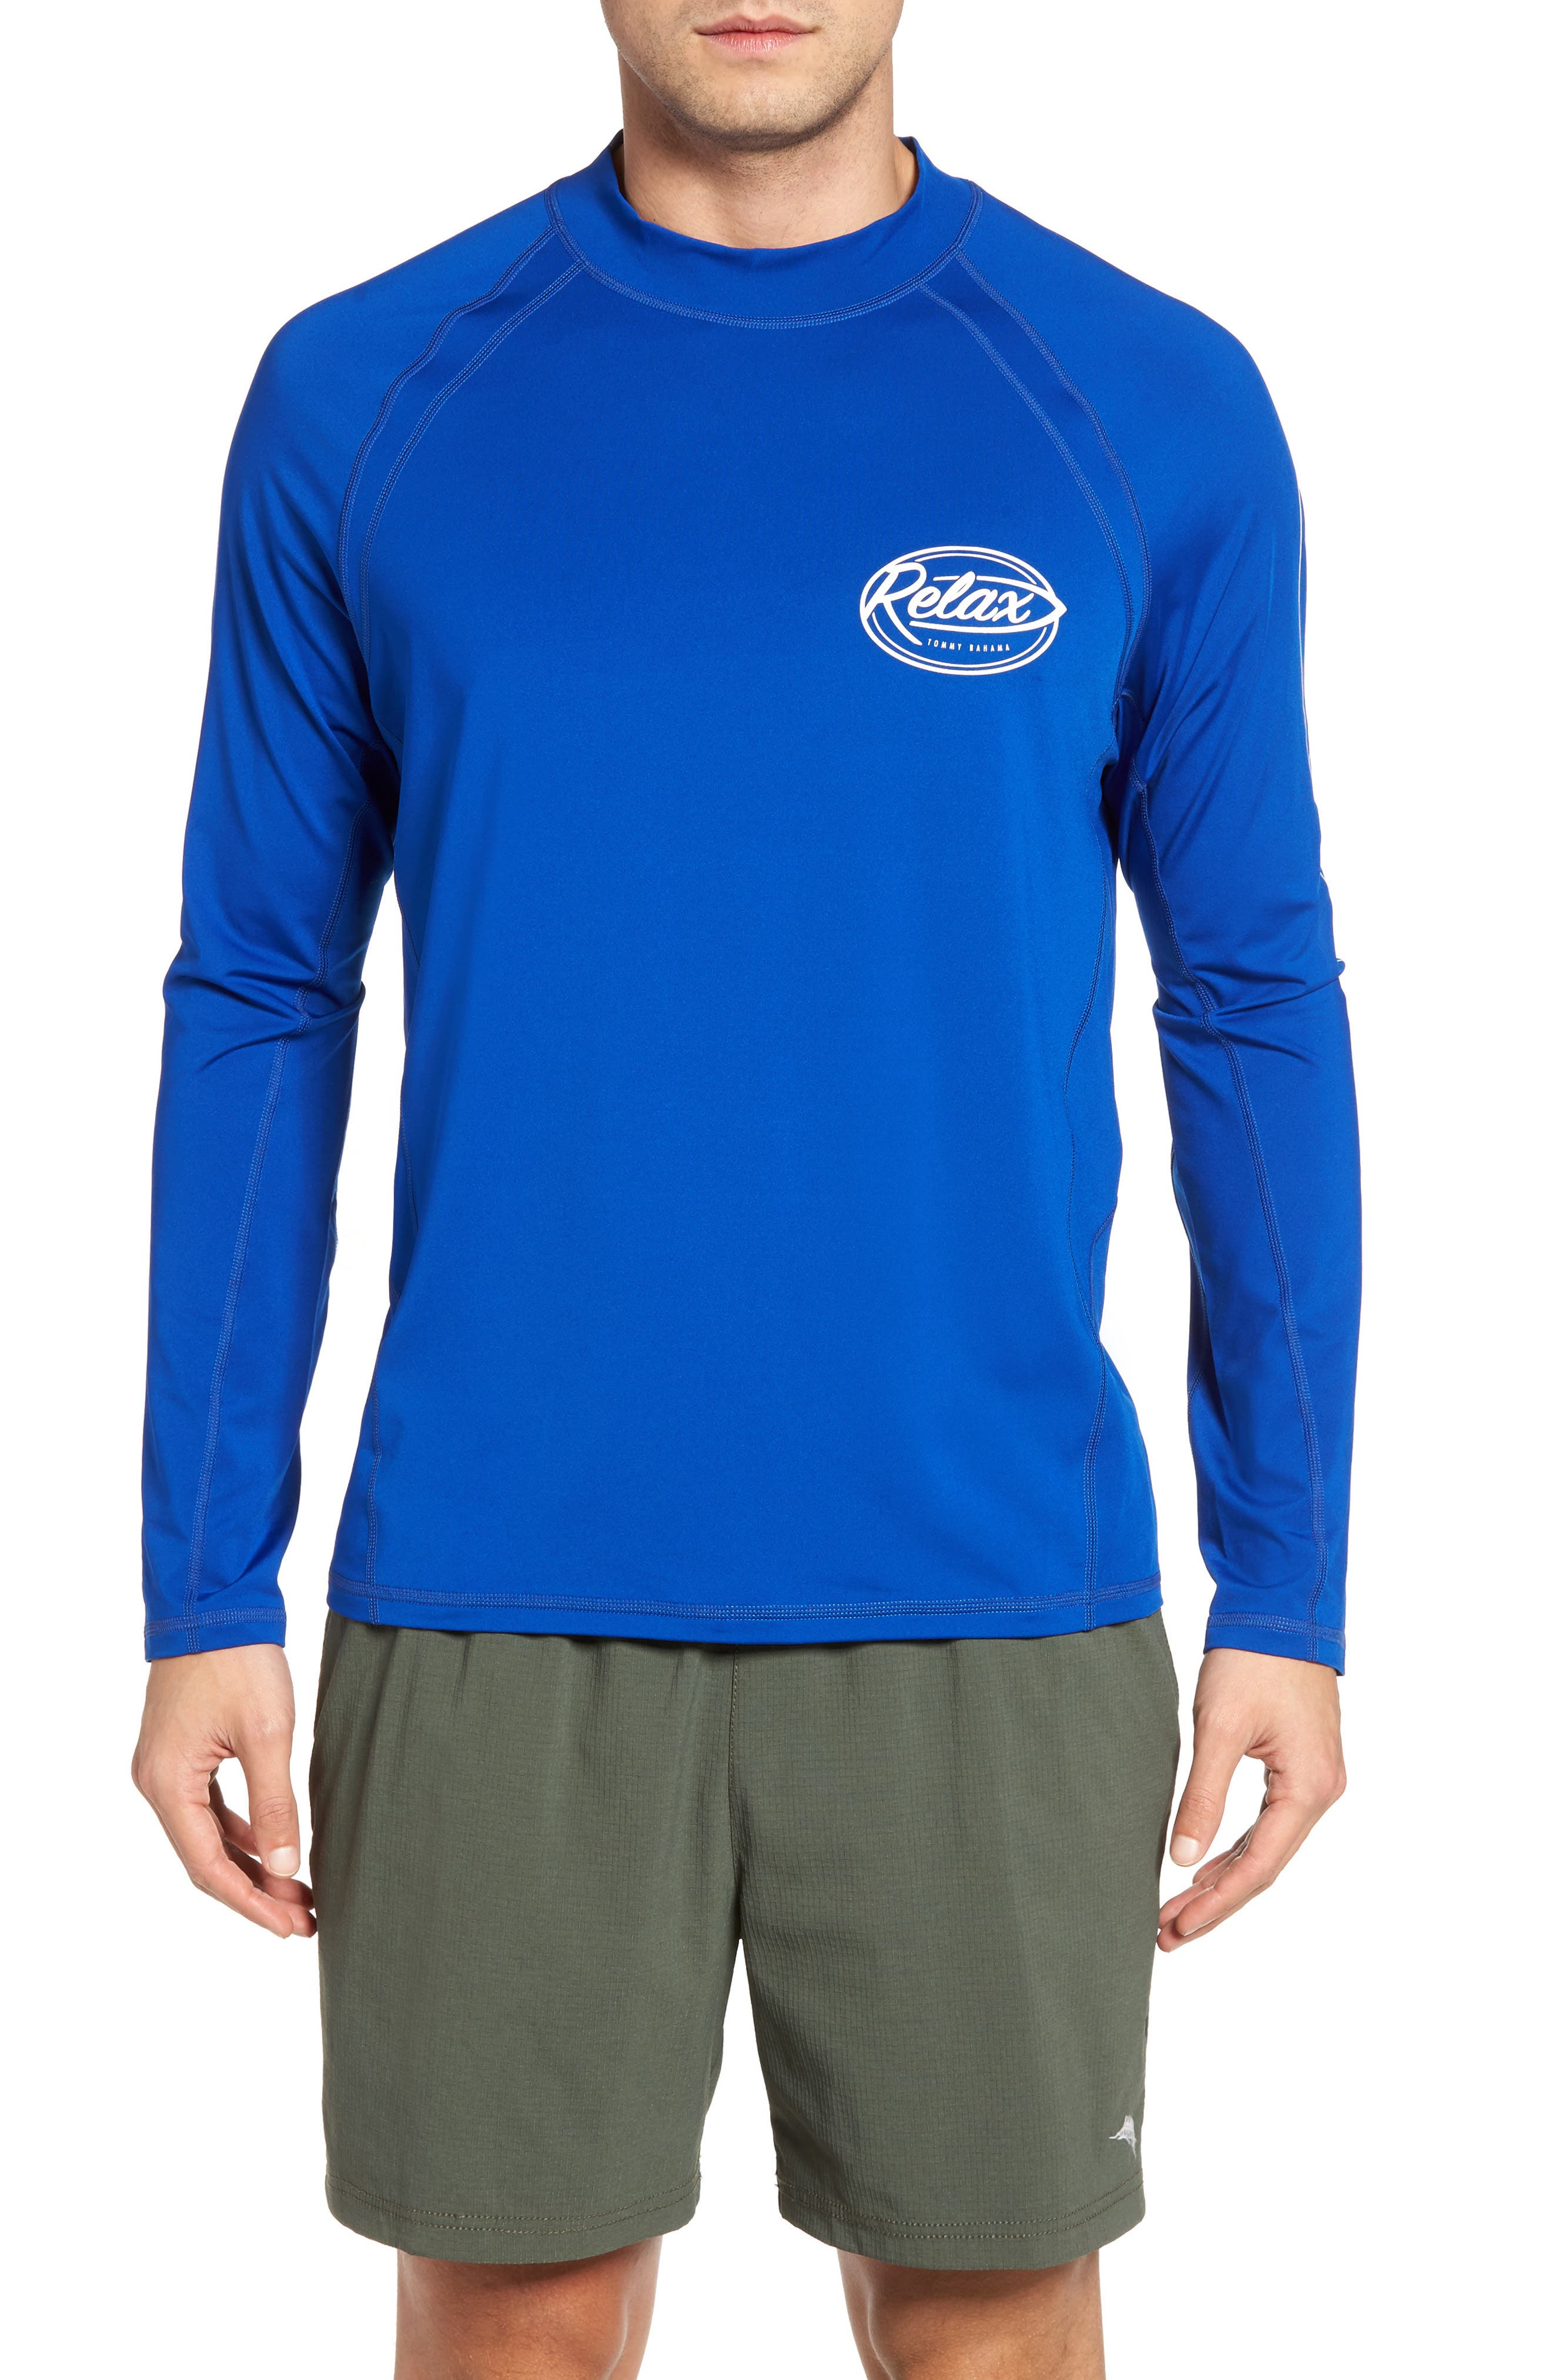 Alternate Image 1 Selected - Tommy Bahama Beach Break Surf Shirt